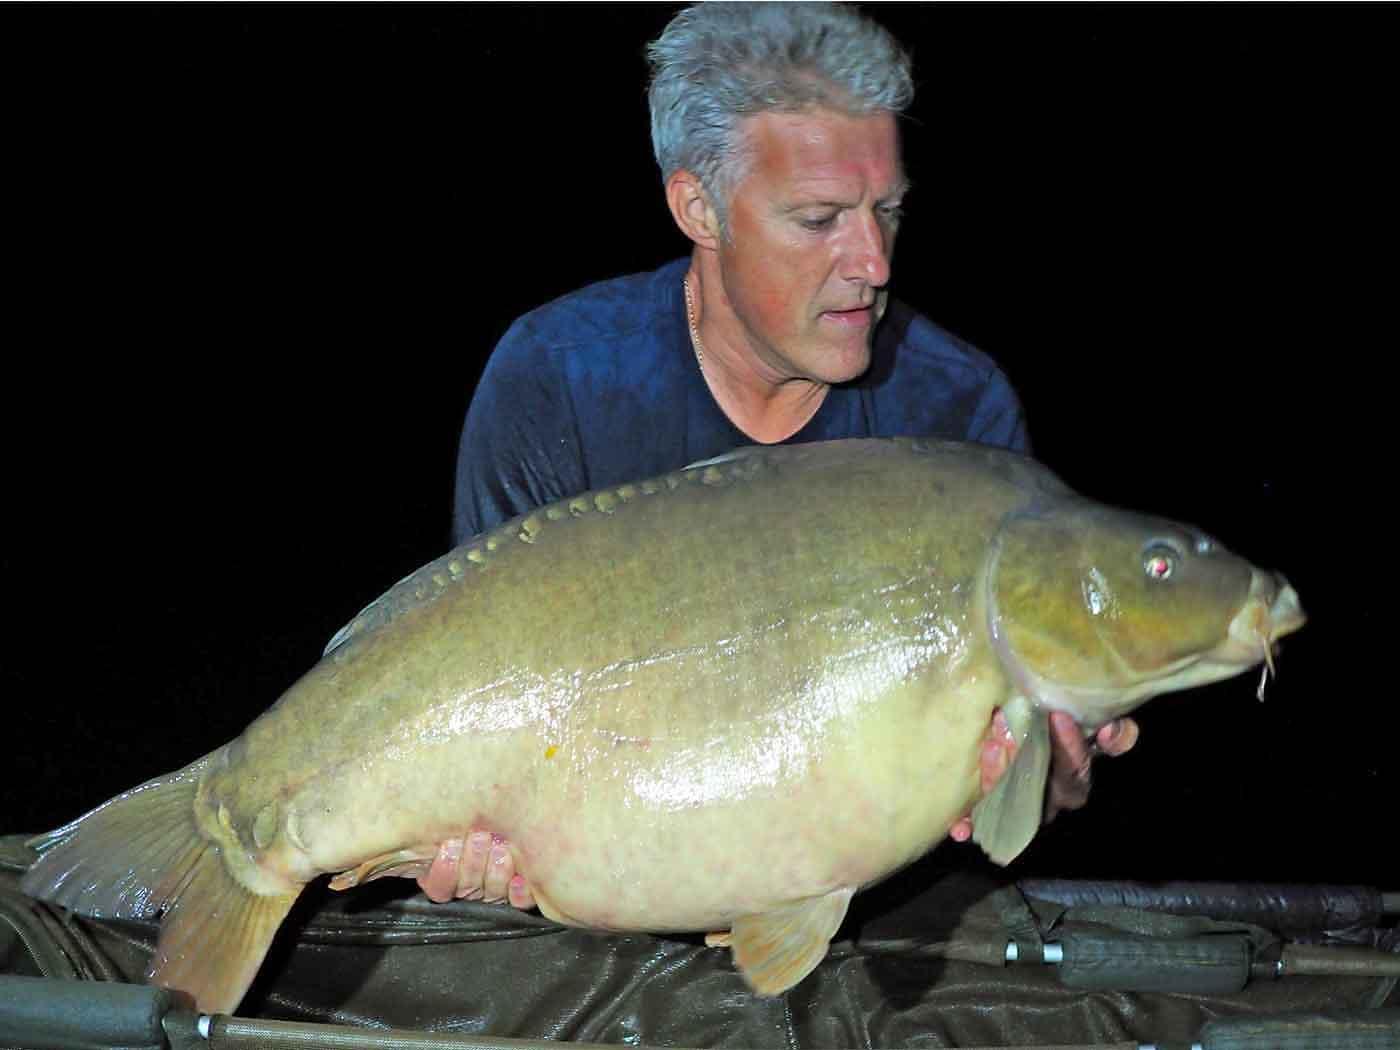 david angler with a mirror carp of 48lbs